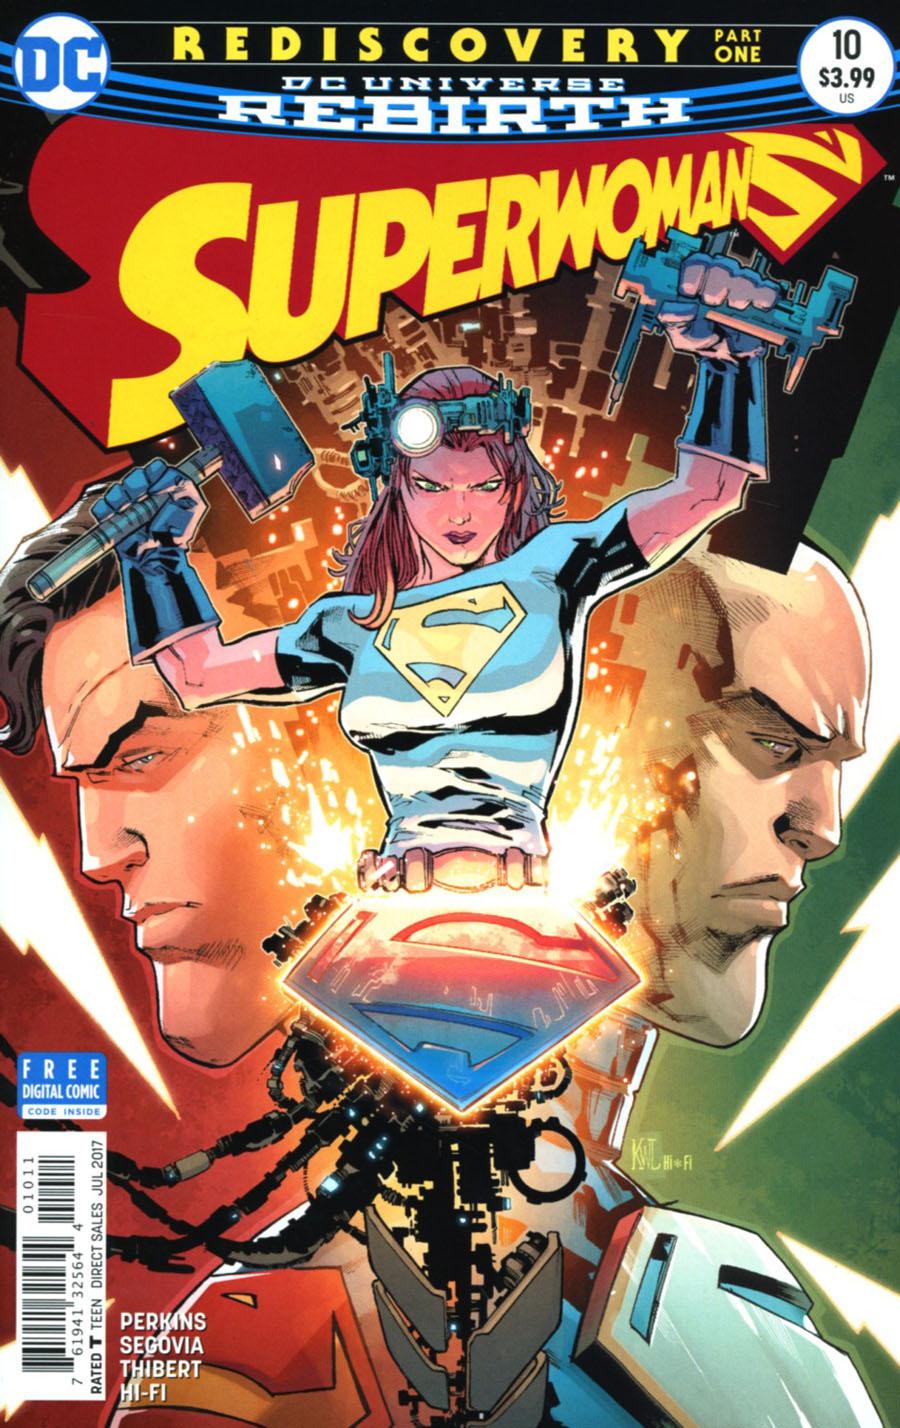 Superwoman #10 Cover A Regular Ken Lashley Cover